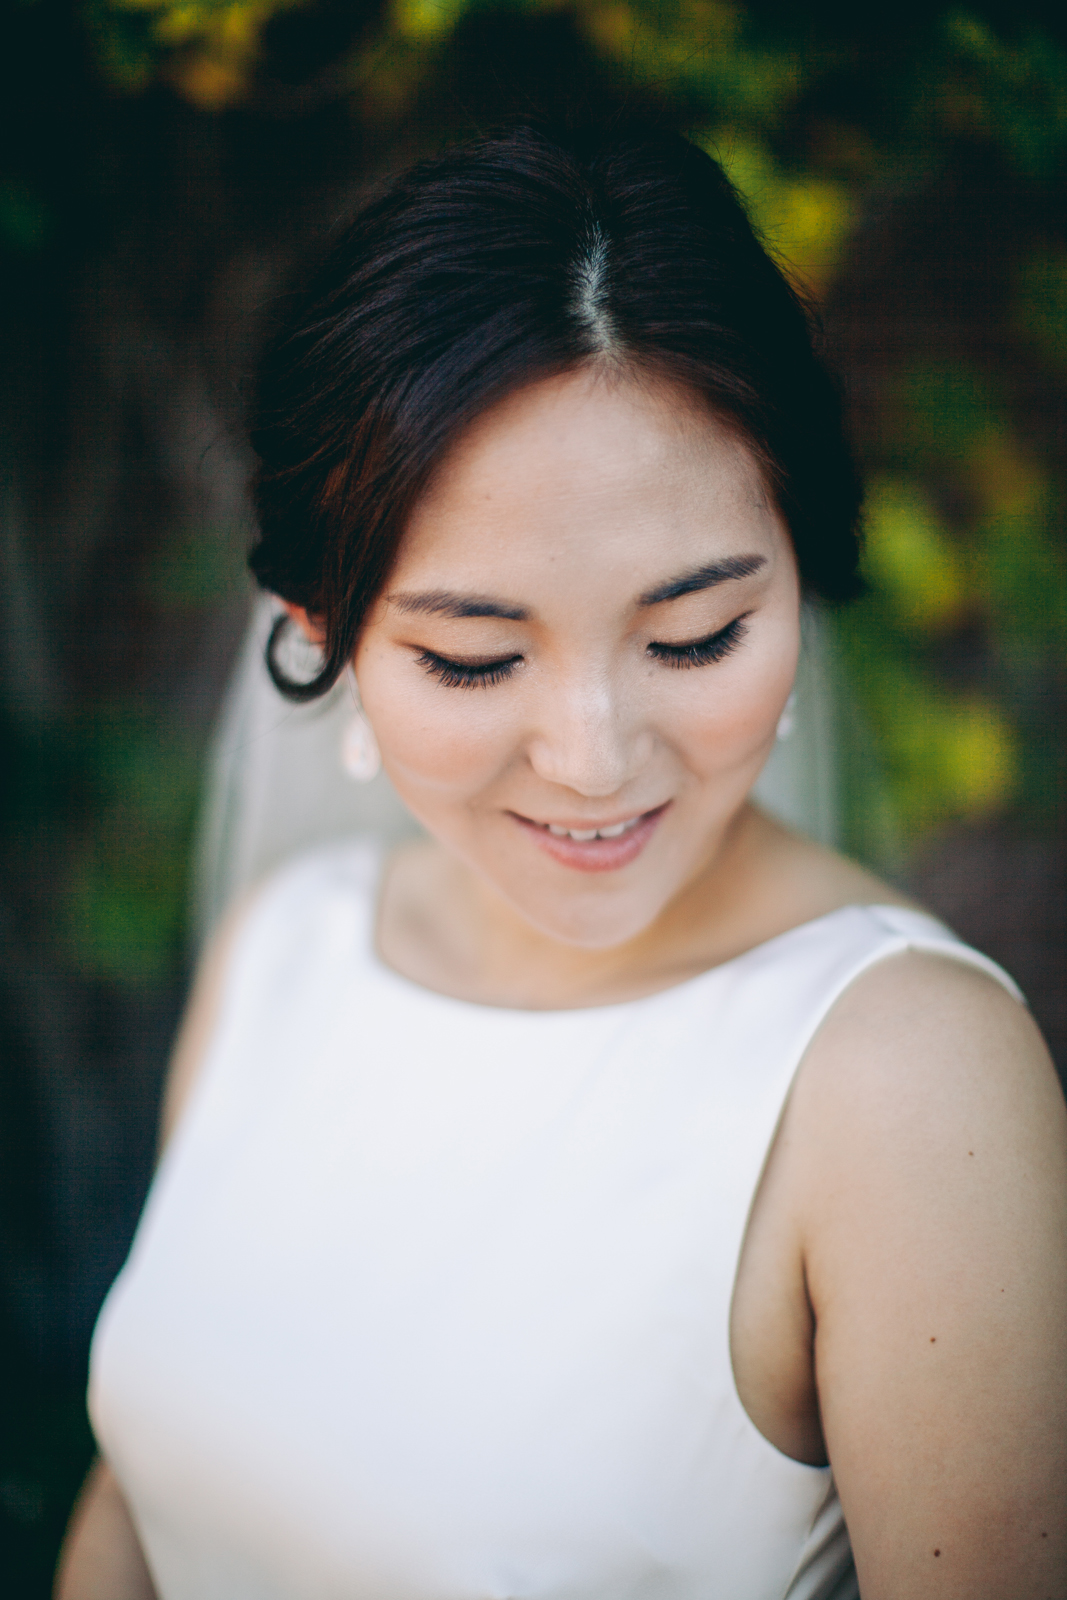 kohl_manison_wedding_photography_sarah_eric_ebony_siovhan_bokeh_photography_036.jpg